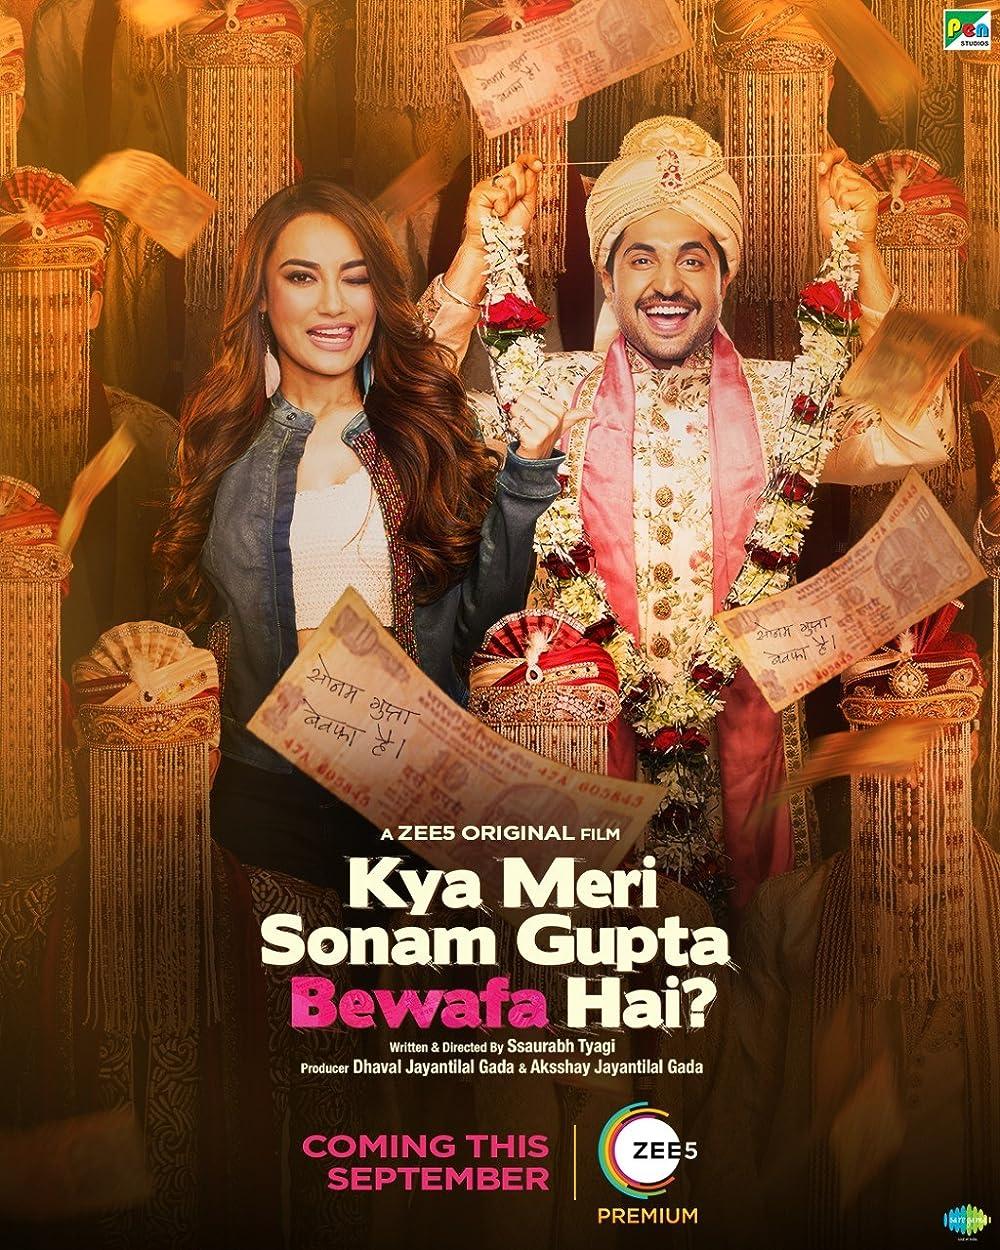 Kya Meri Sonam Gupta Bewafa Hai 2021 Hindi Movie Official Trailer 1080p ZEE5 HDRip 45MB Download